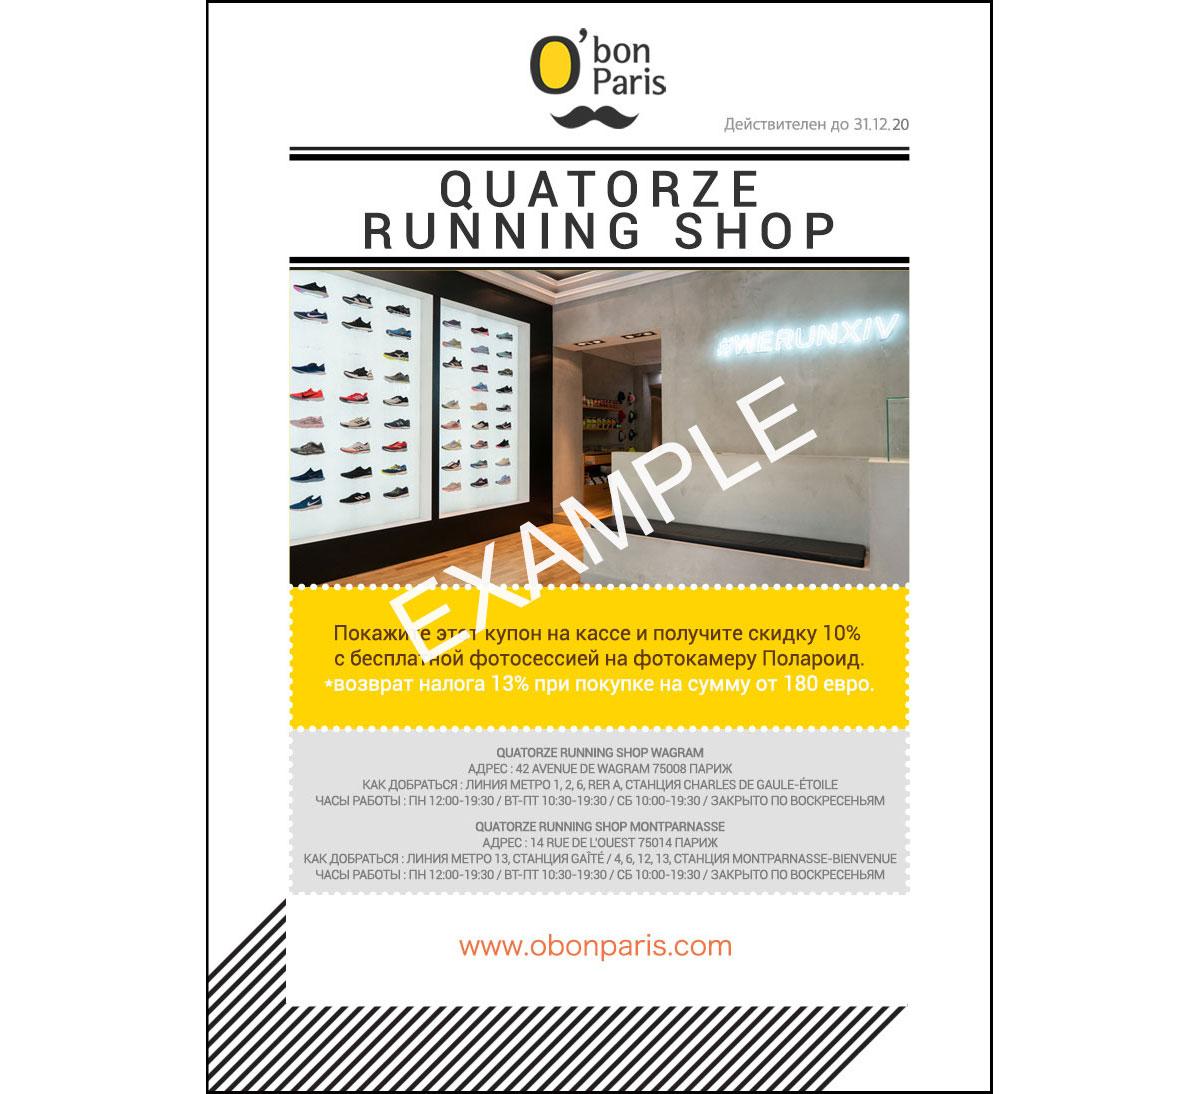 Quatorze Running Shop coupon